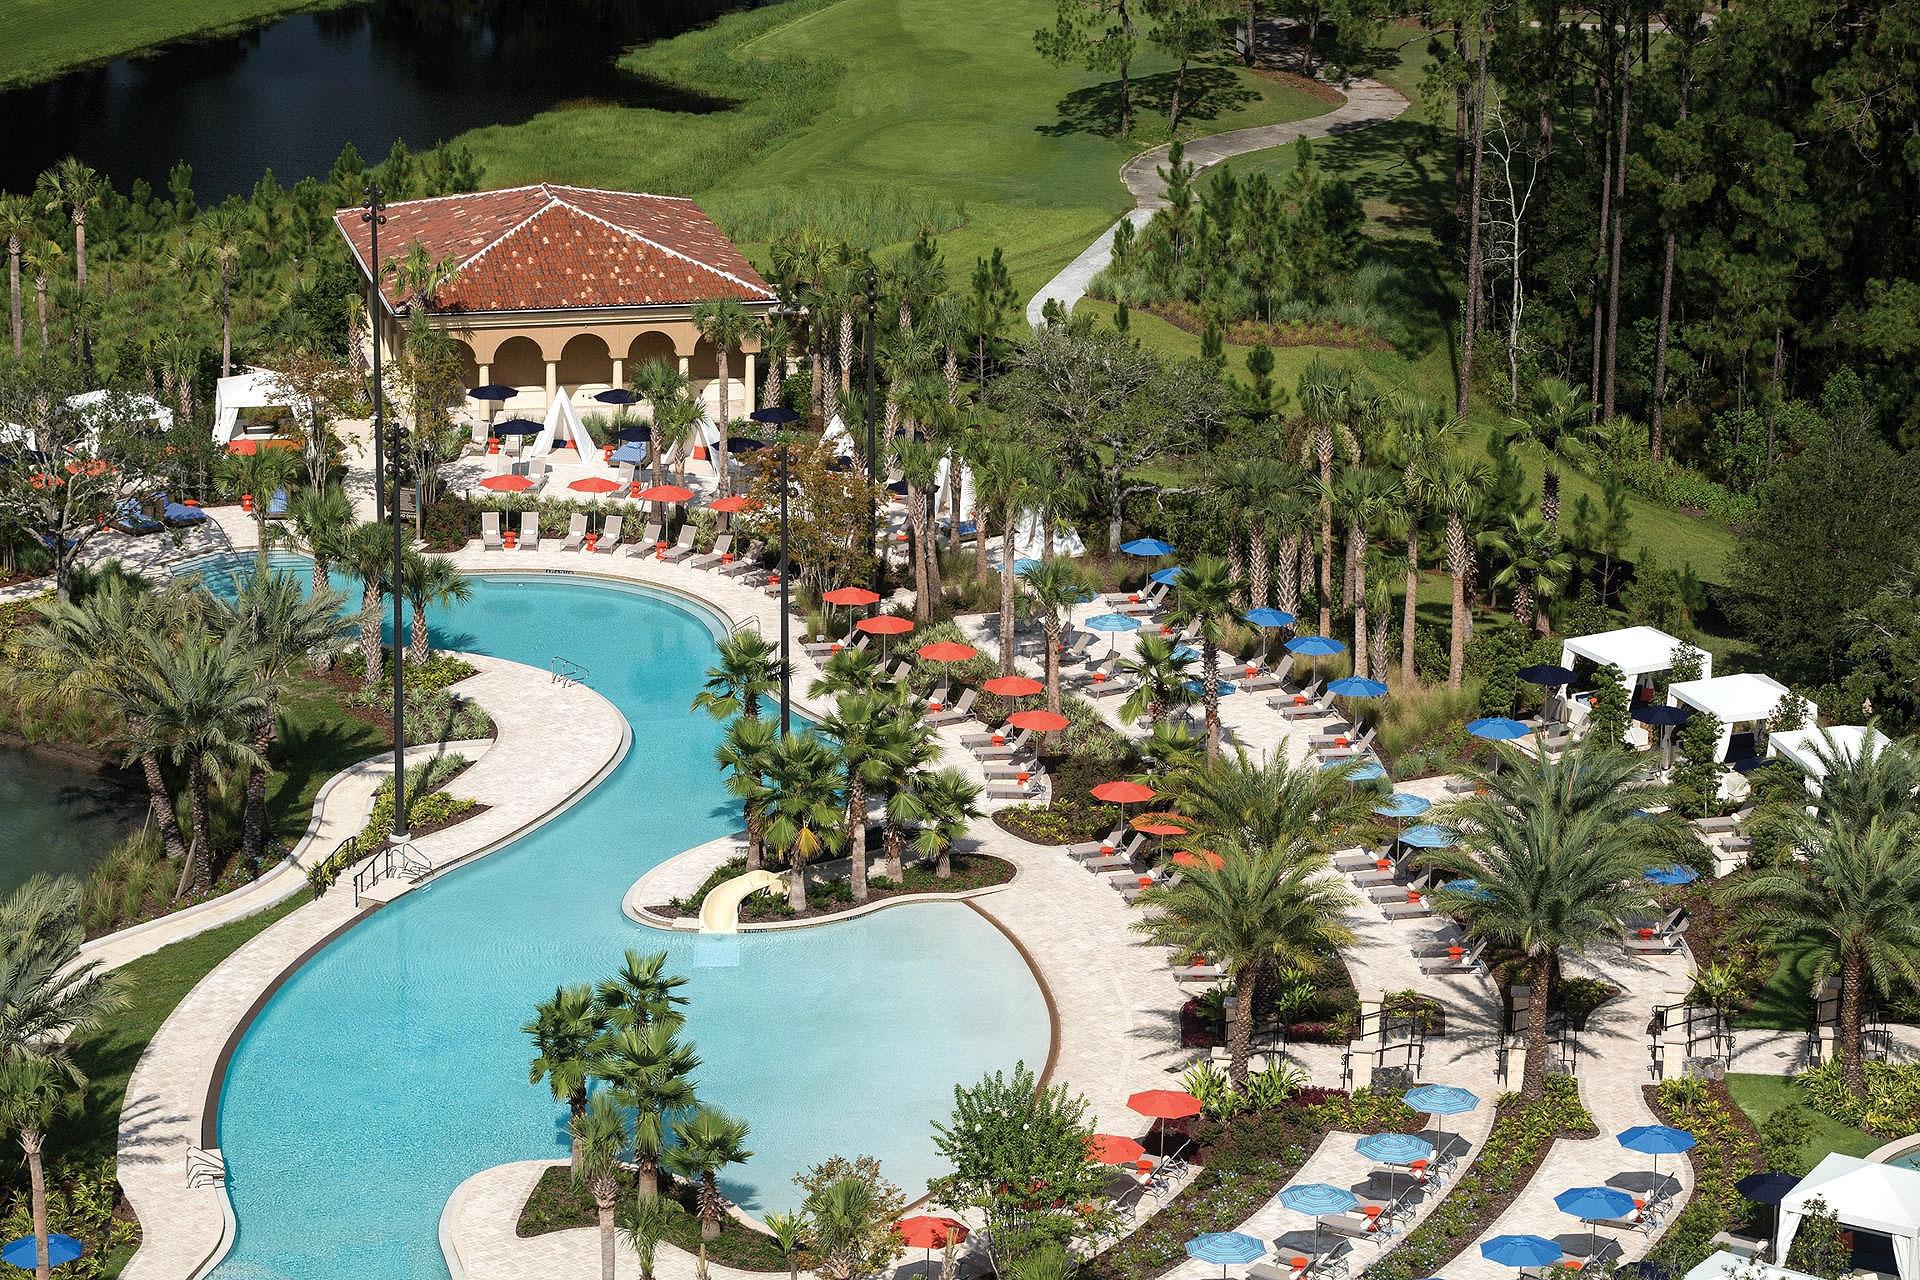 Aerial View of Four Seasons Resort Orlando at Walt Disney World; Courtesy of Four Seasons Resort Orlando at Walt Disney World